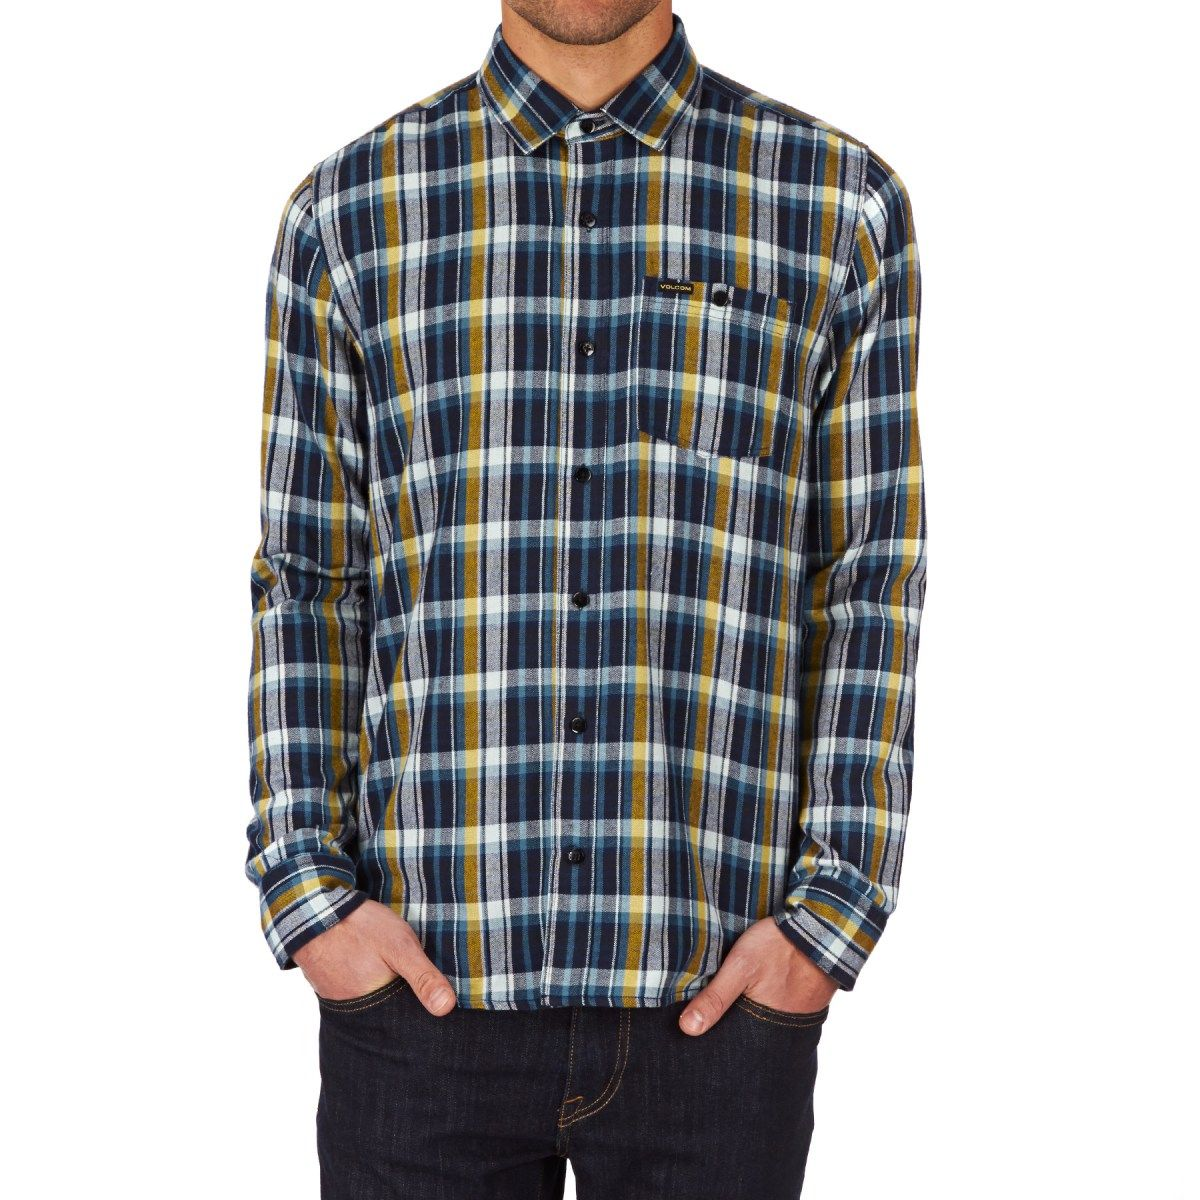 Men's Volcom Shirts - Volcom Bartlett Long Sleeve Shirt - Navy